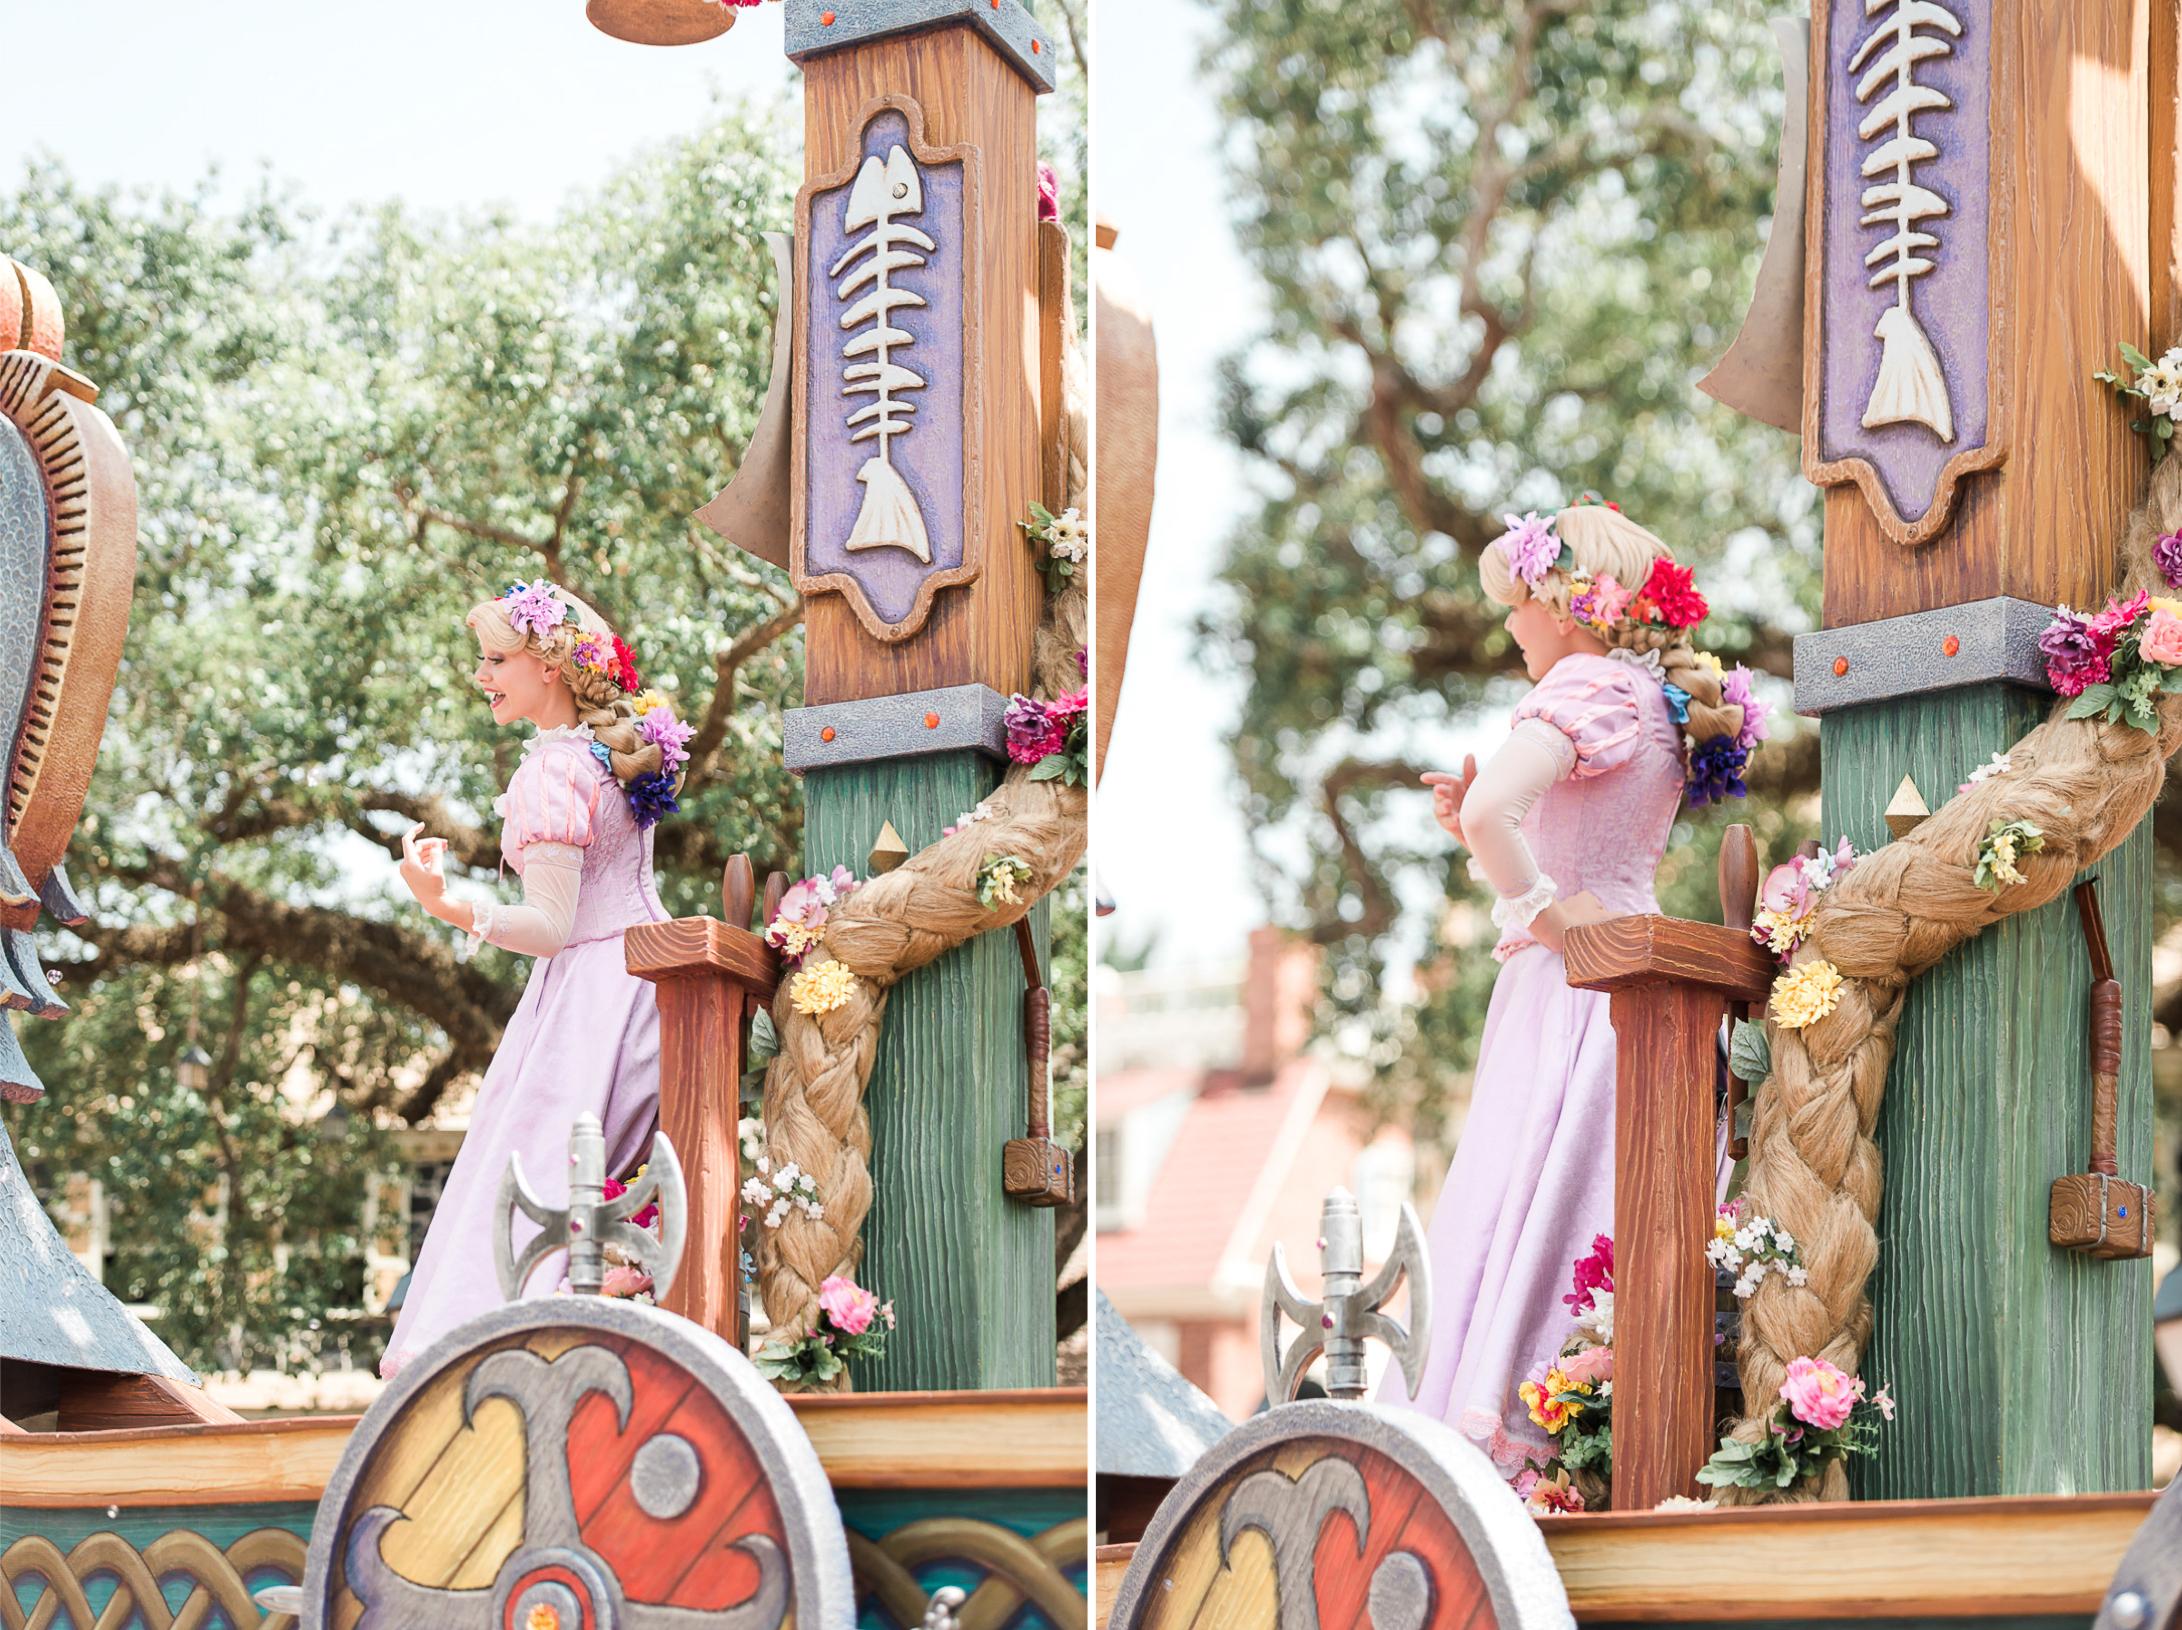 KateTaramykinStudios-Disney-World-Photographer-May-2017-9.jpg